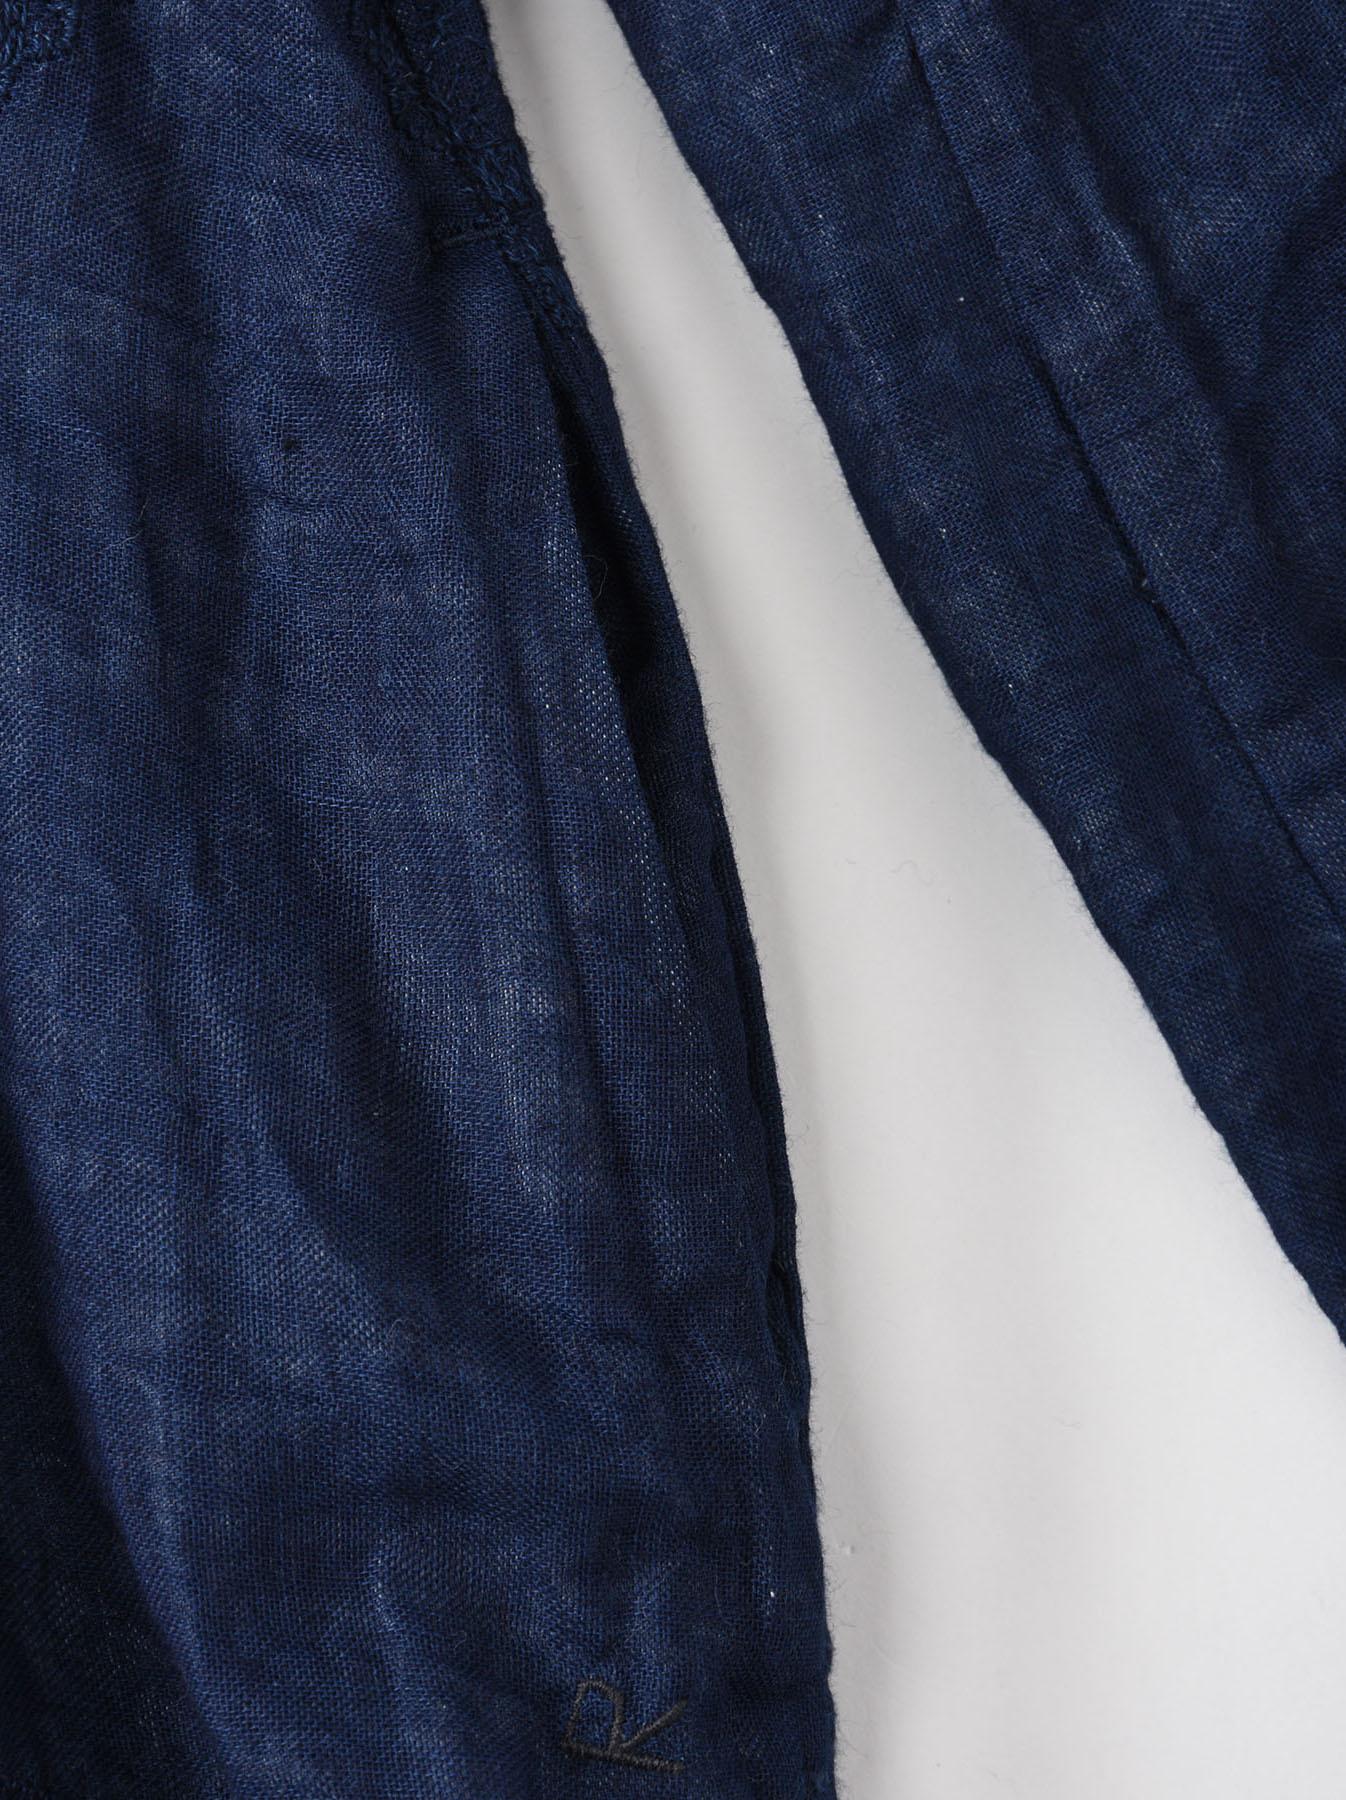 Indigo Double Cloth Lace Embroidery Dress-7